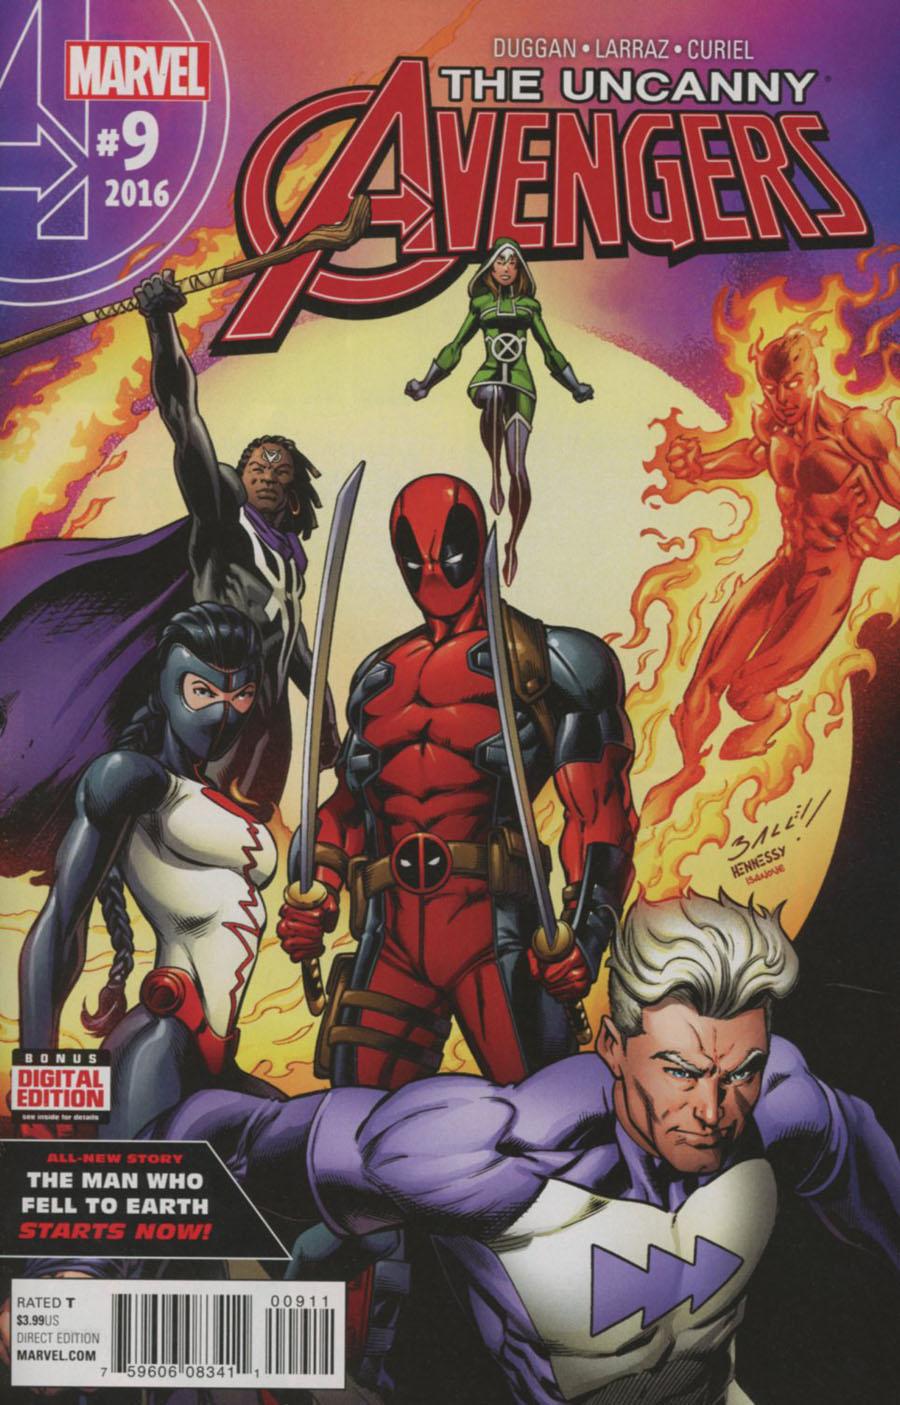 Uncanny Avengers Vol 3 #9